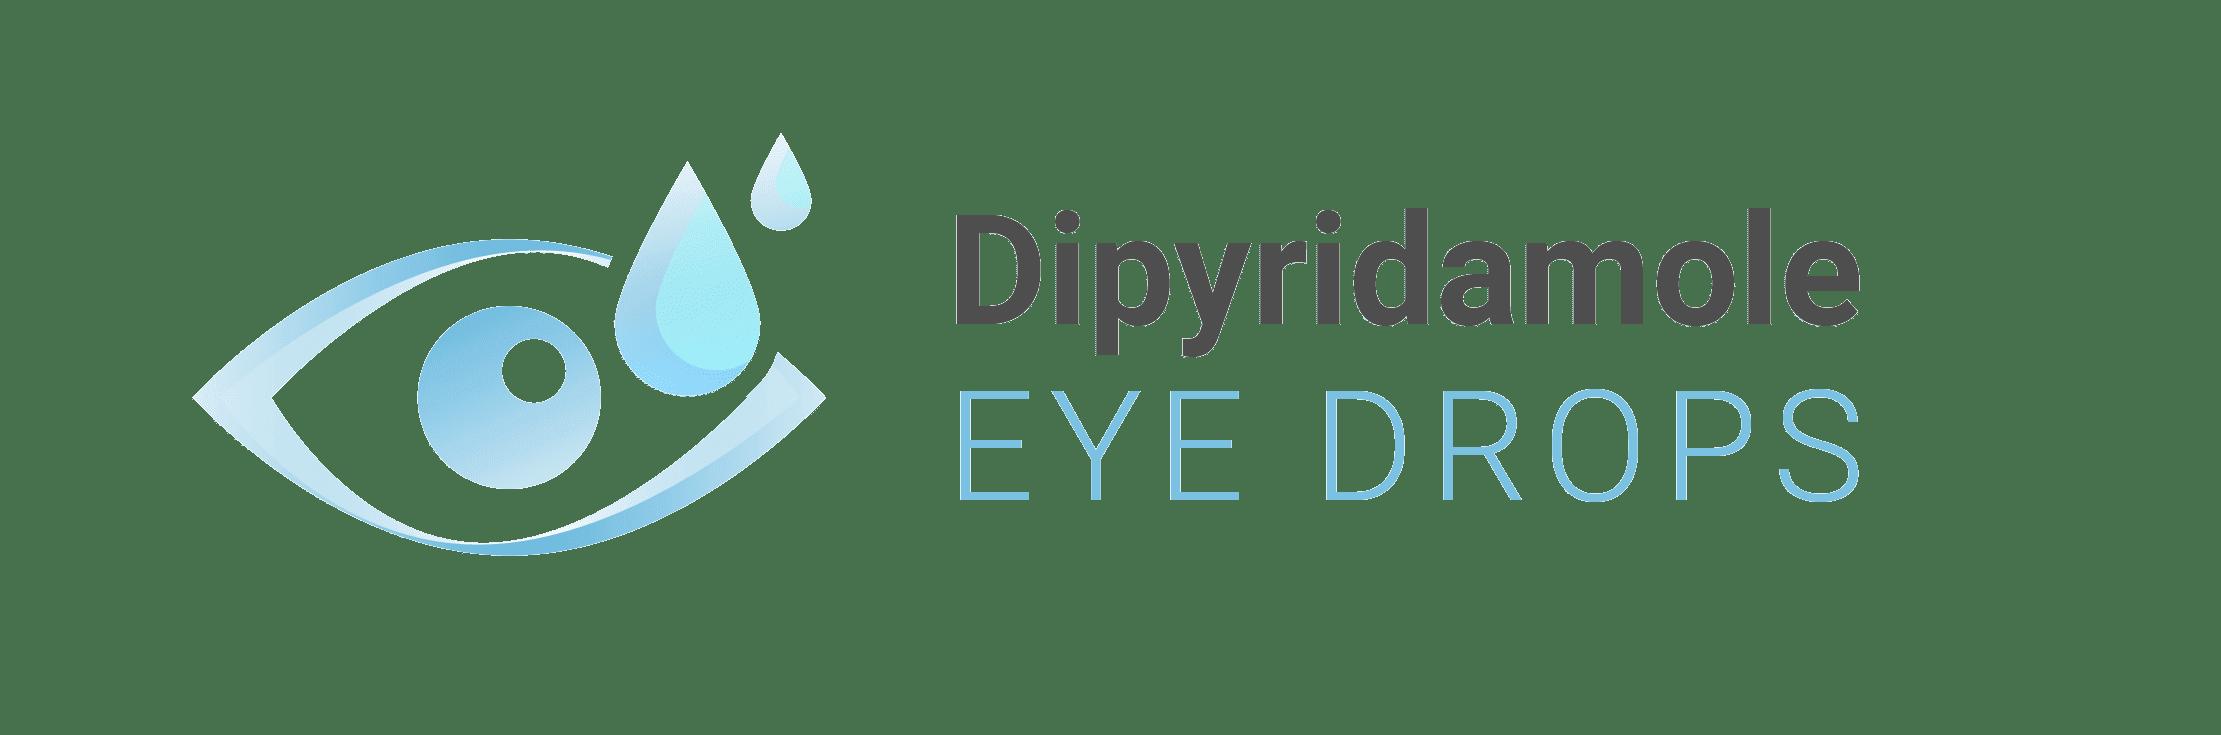 Dipyridamole Eye Drops